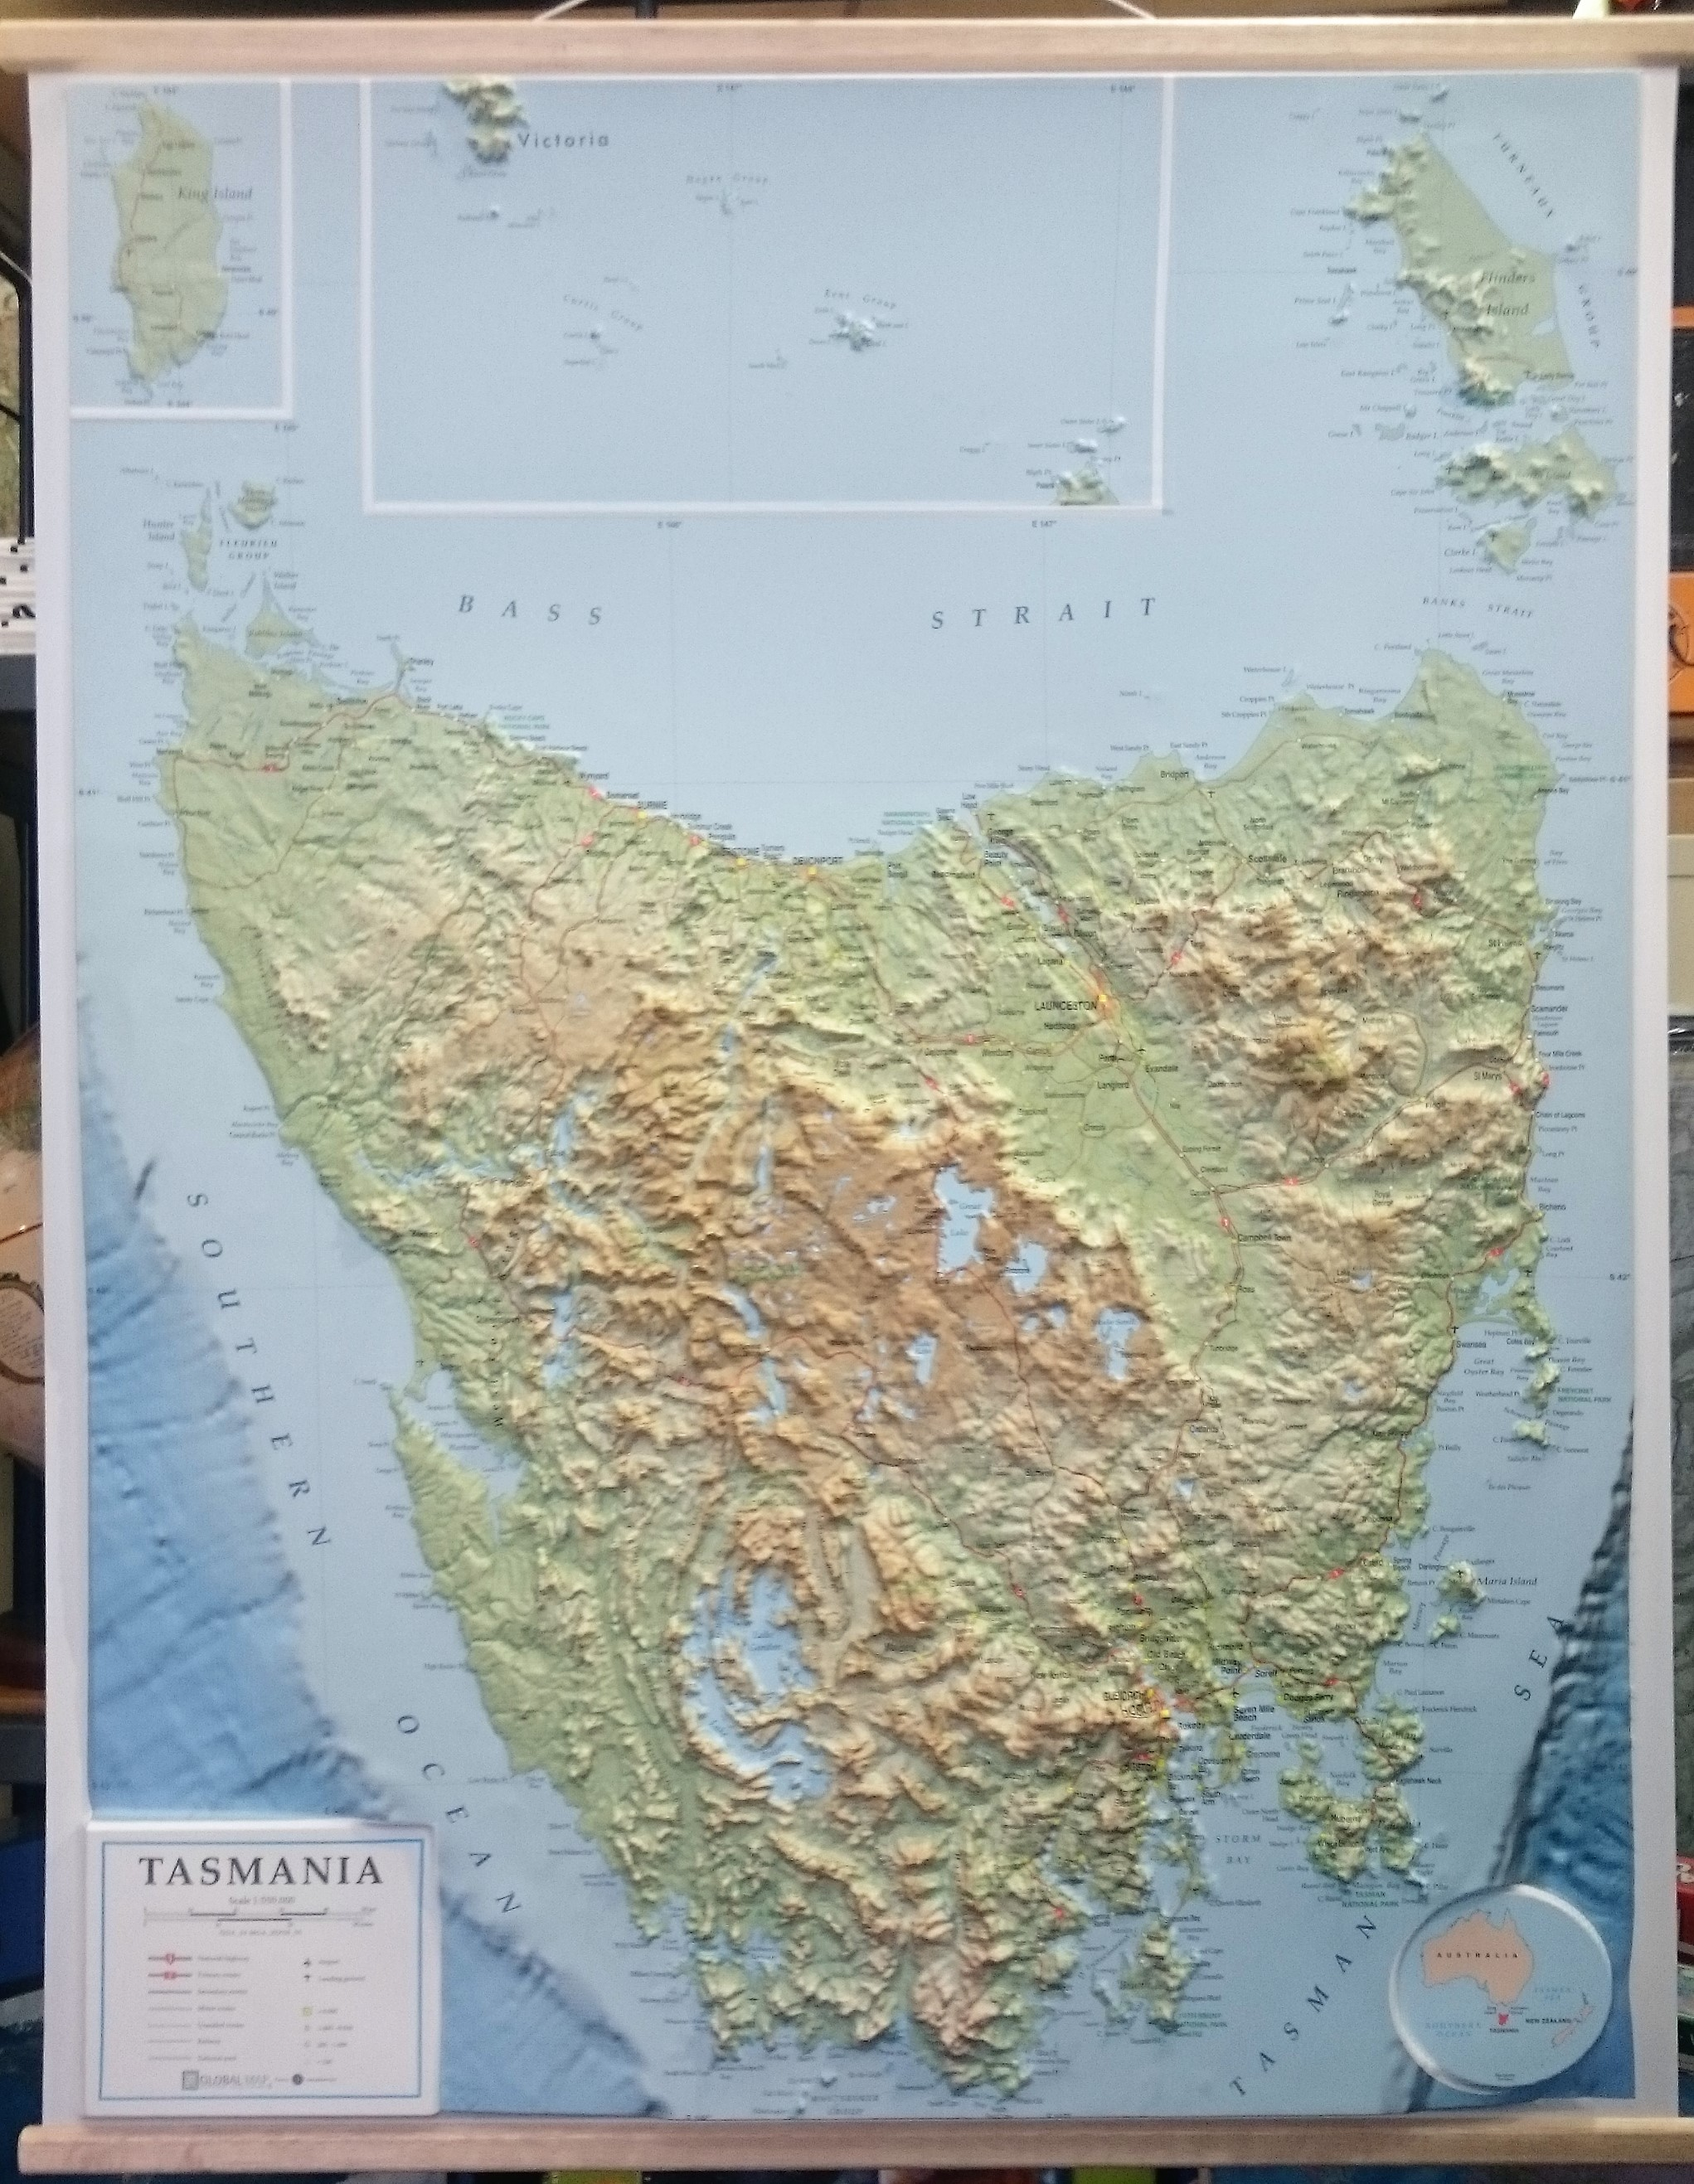 3d Terrain Map Of Uk.Tasmania 3d Relief Map The Tasmanian Map Centre